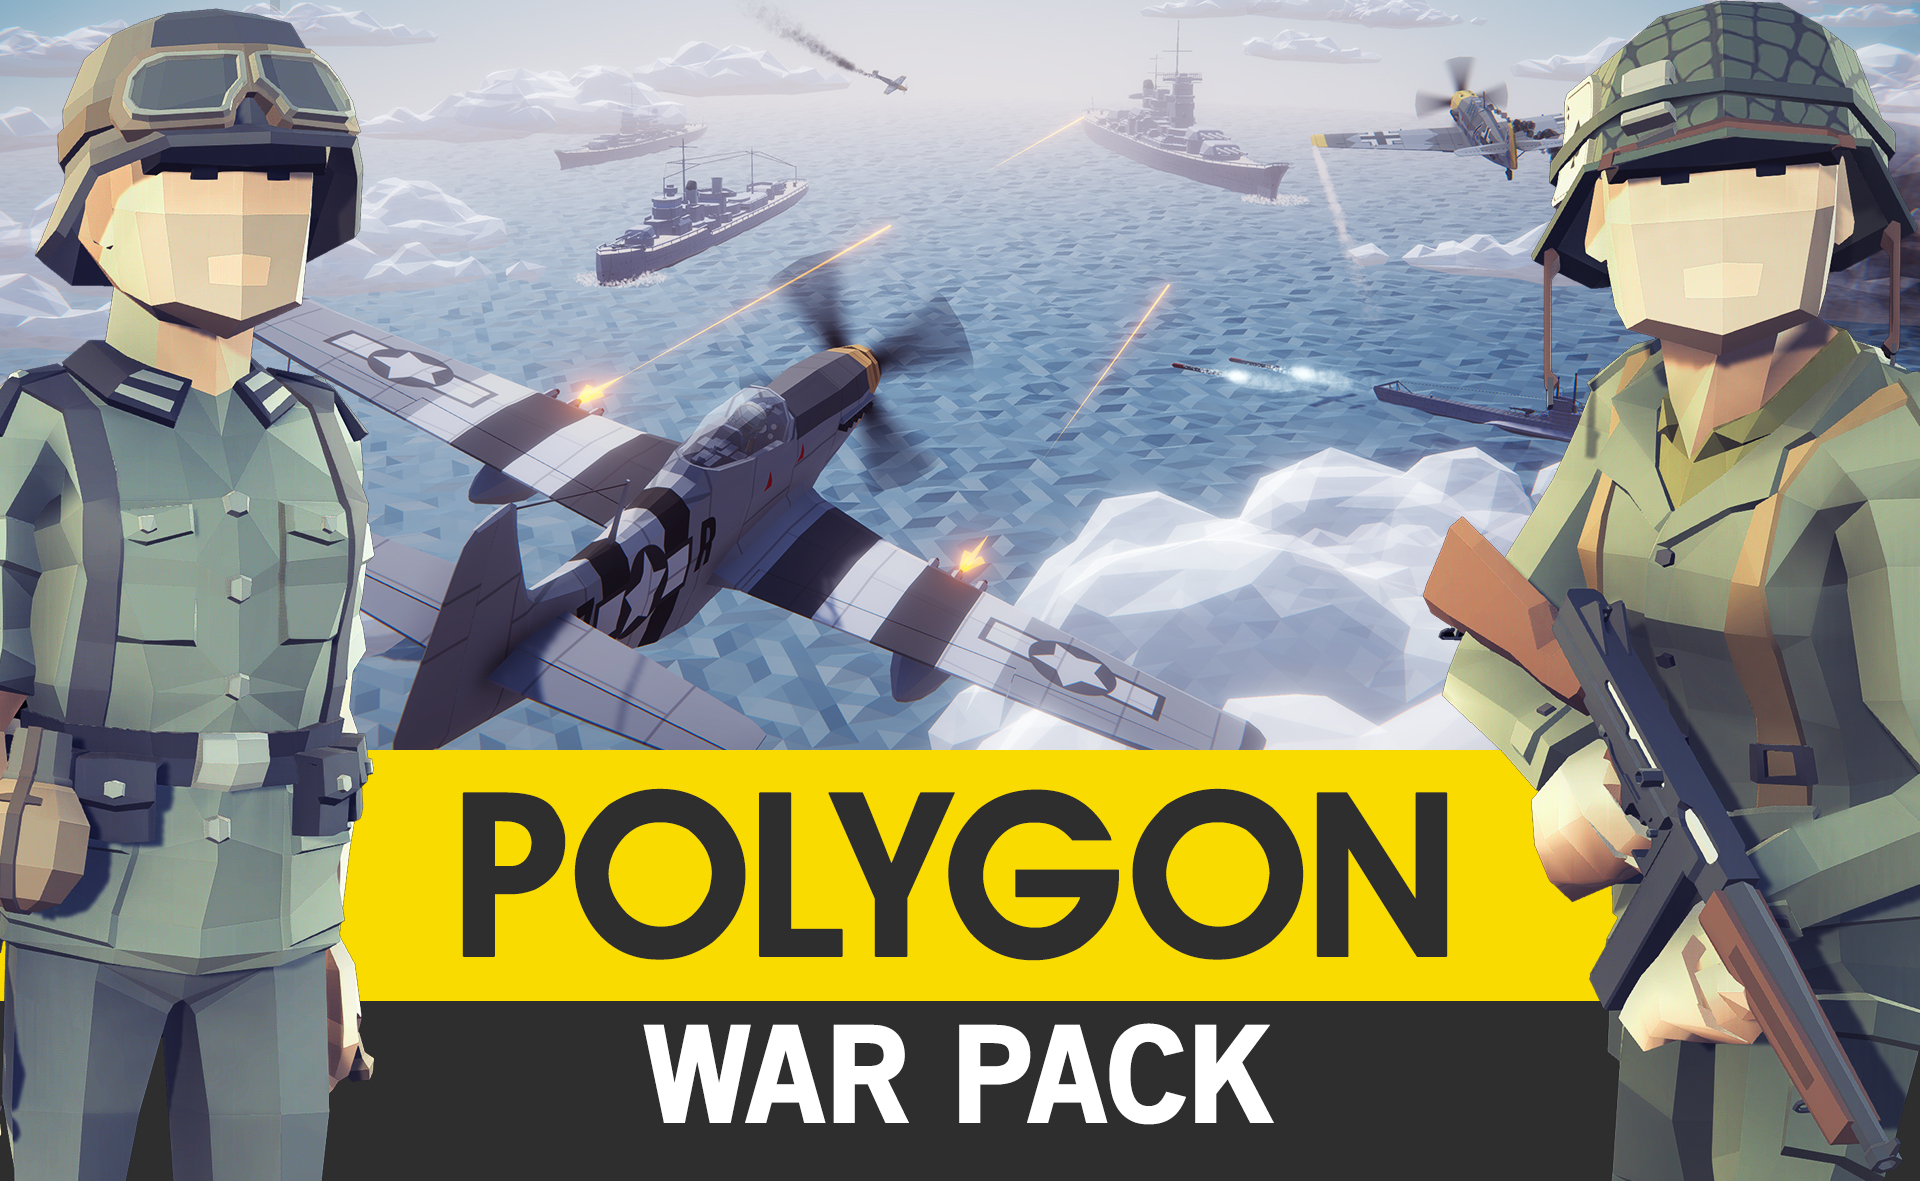 POLYGON - War